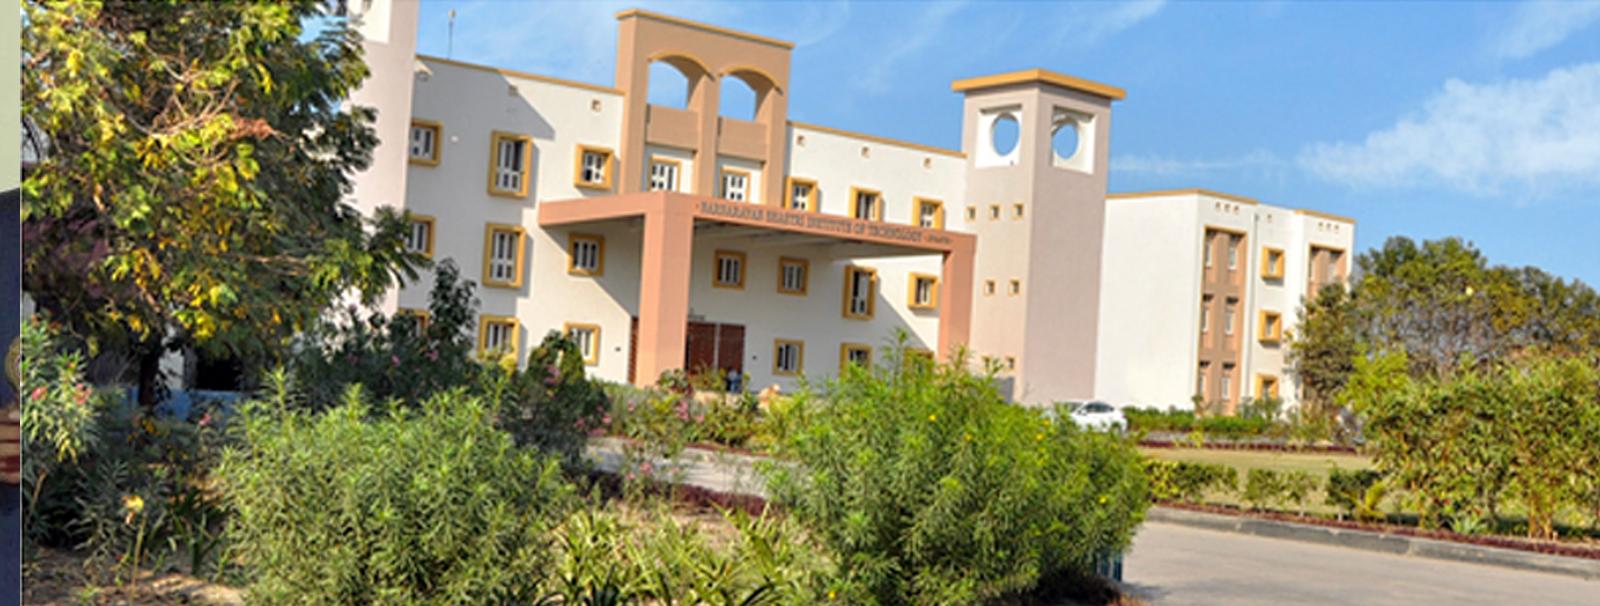 Narnarayan Shastri Institute of Nursing, Ahmedabad Image